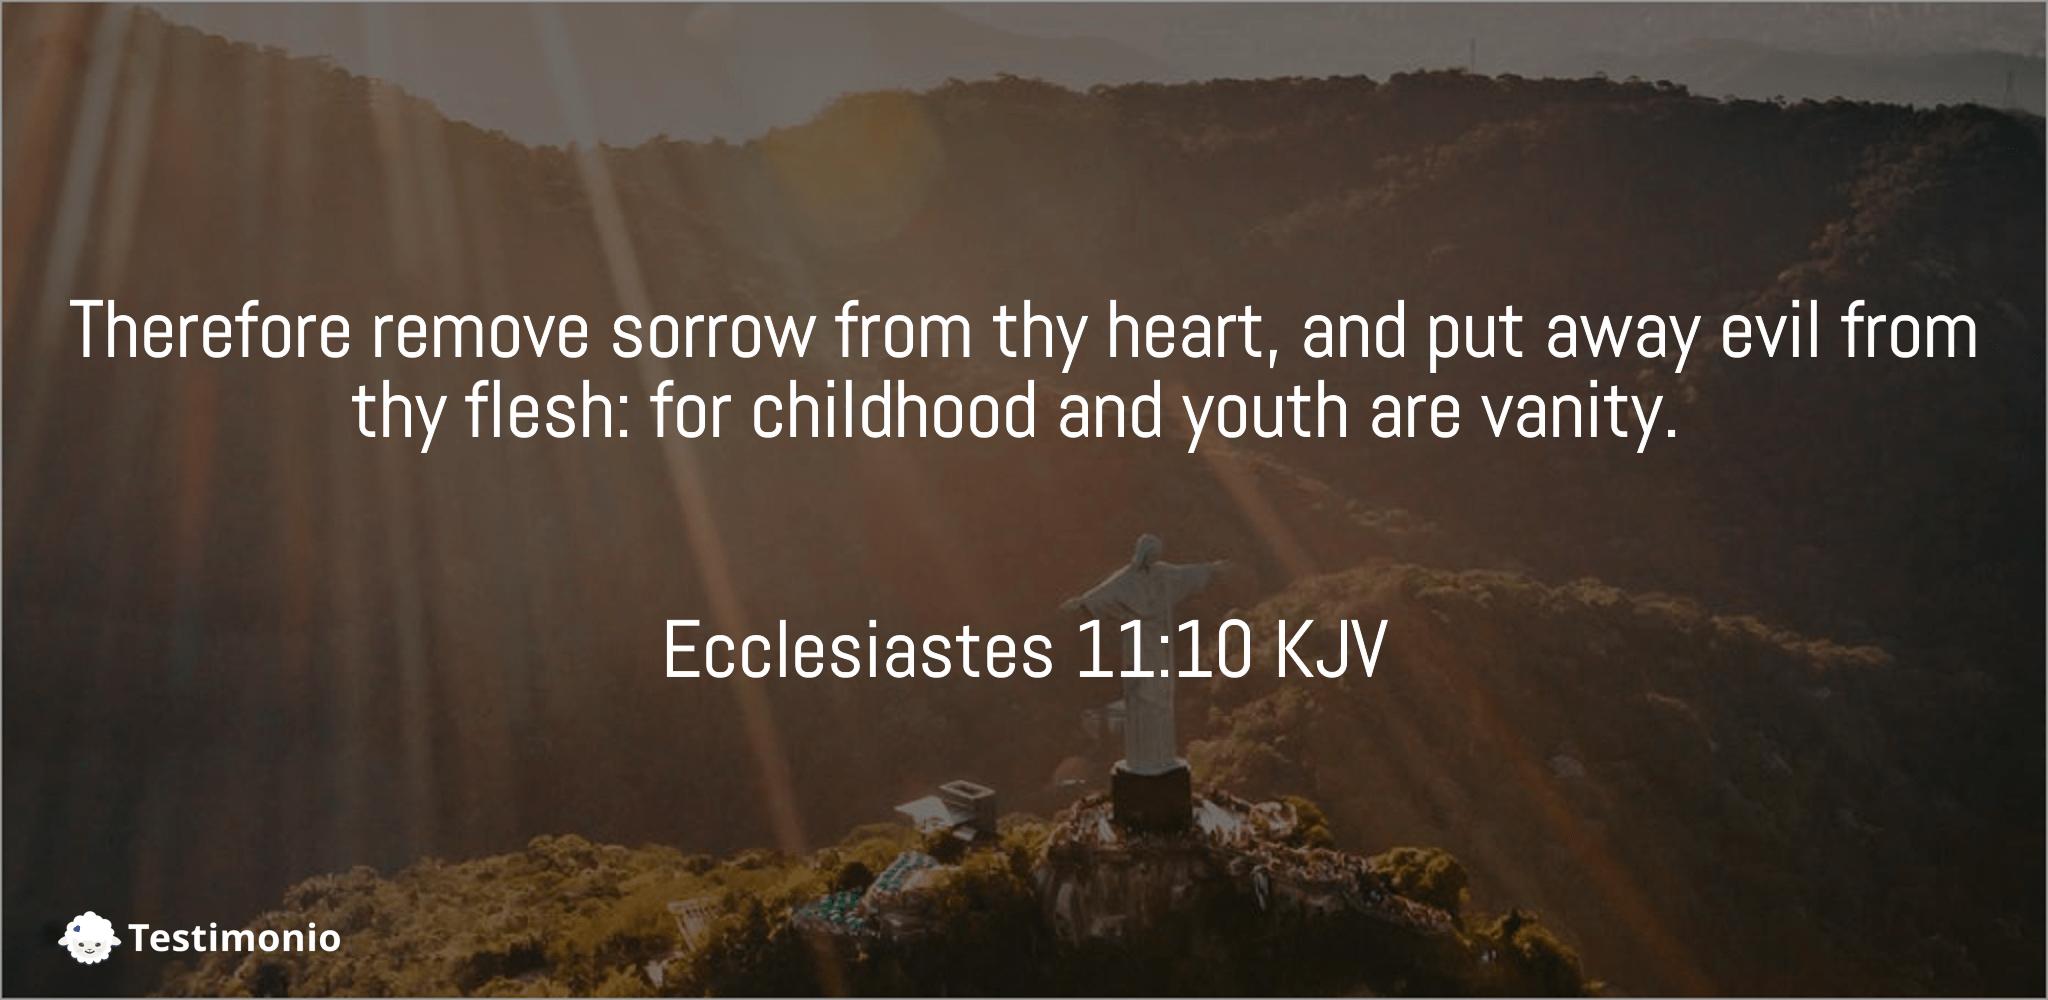 Ecclesiastes 11:10